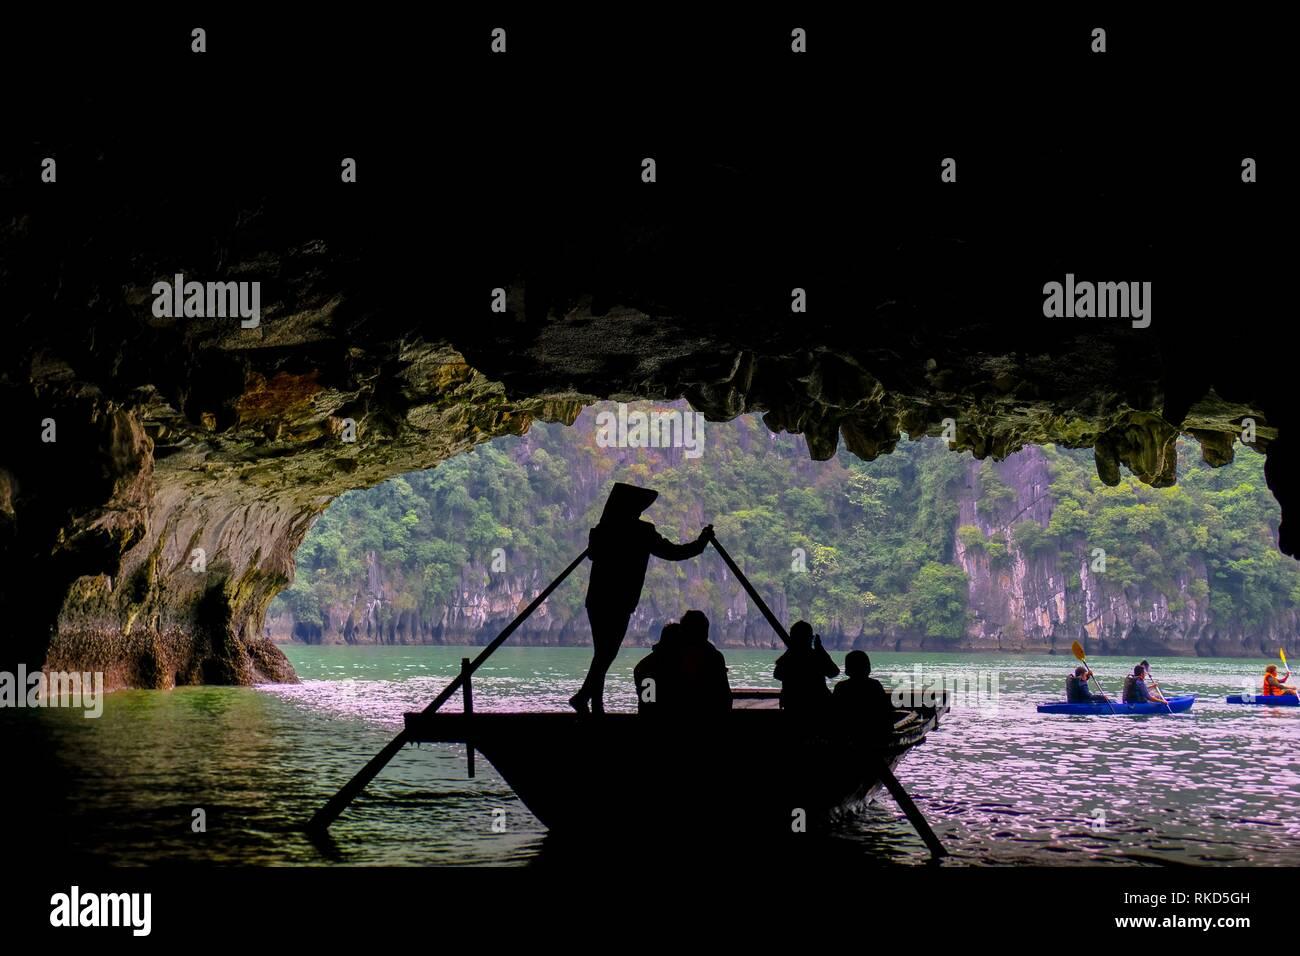 Vietnam, Ha Long Bay: Ha Long Bay ist ein UNESCO-Weltkulturerbe und beliebtes Reiseziel in der Provinz Quang Ninh, Vietnam. Administrativ, Stockbild